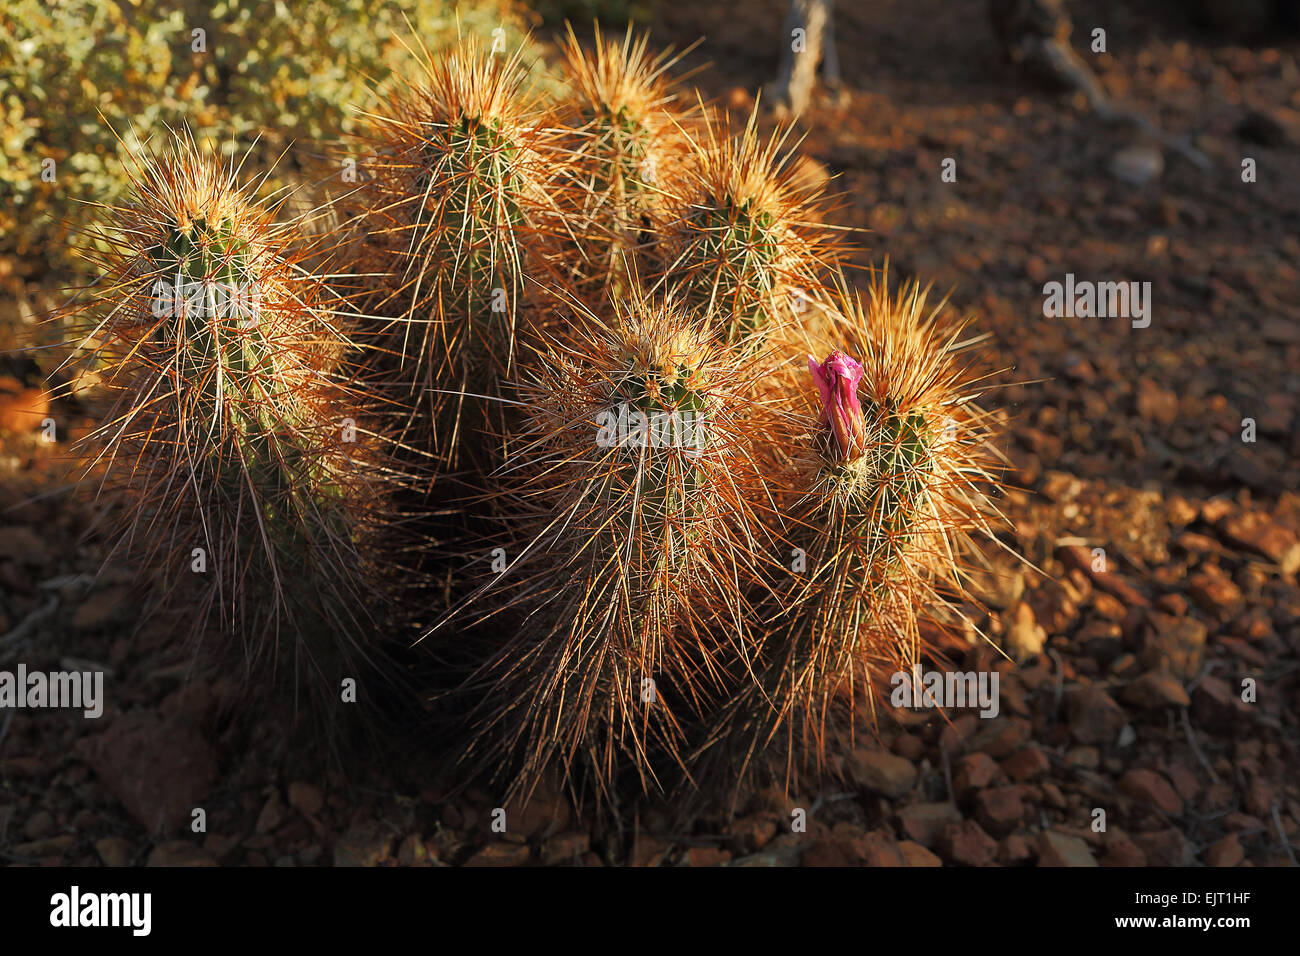 Beautiful pink hedgehog cactus flowers in the desert Southwest - Stock Image